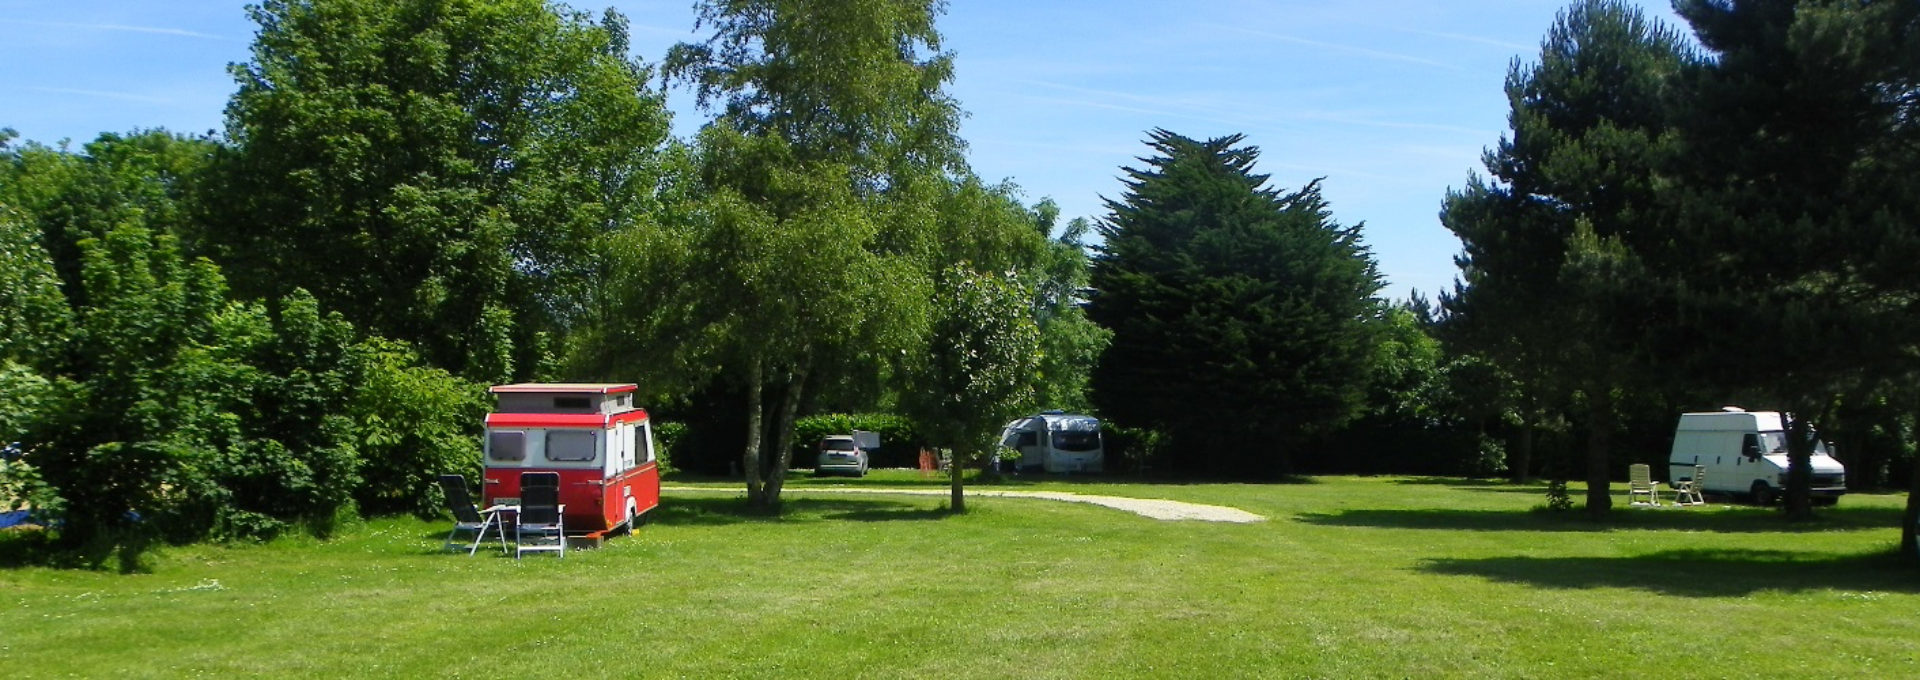 Camping La Pature